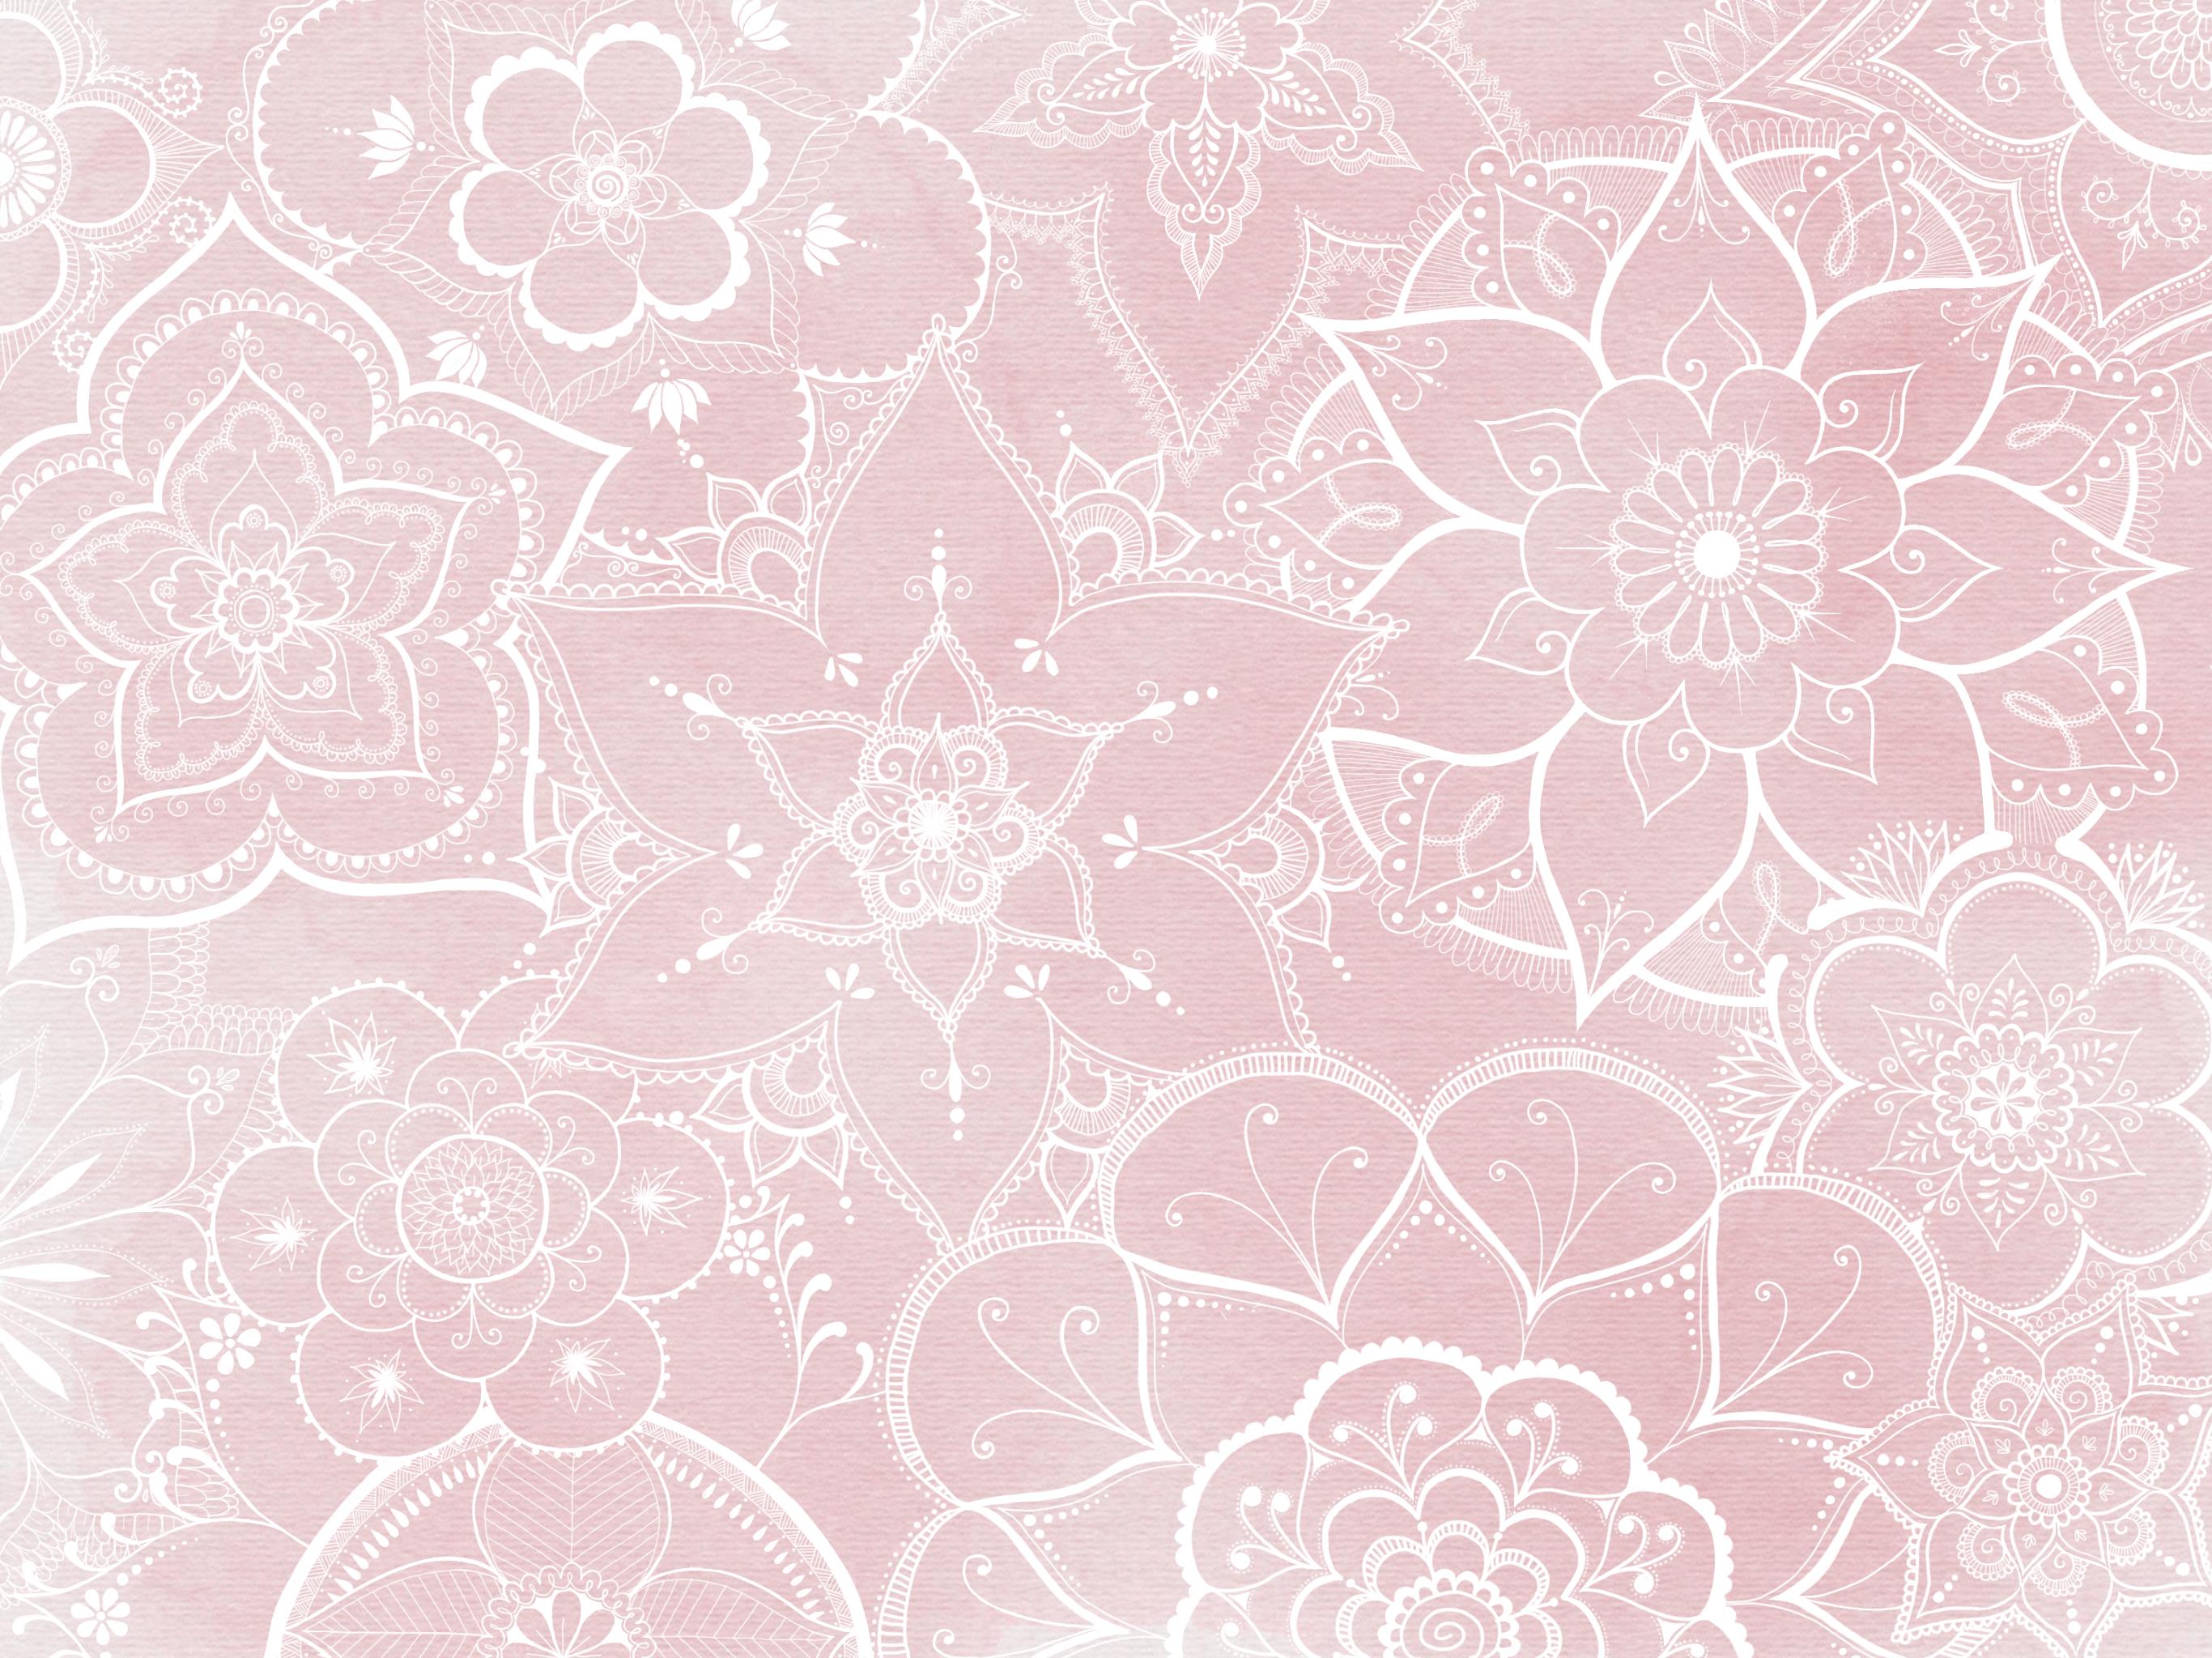 Pin On Ipad Pro Others Wallpaper: Dusty Pink Mandala Background Created On IPad Pro By @mol